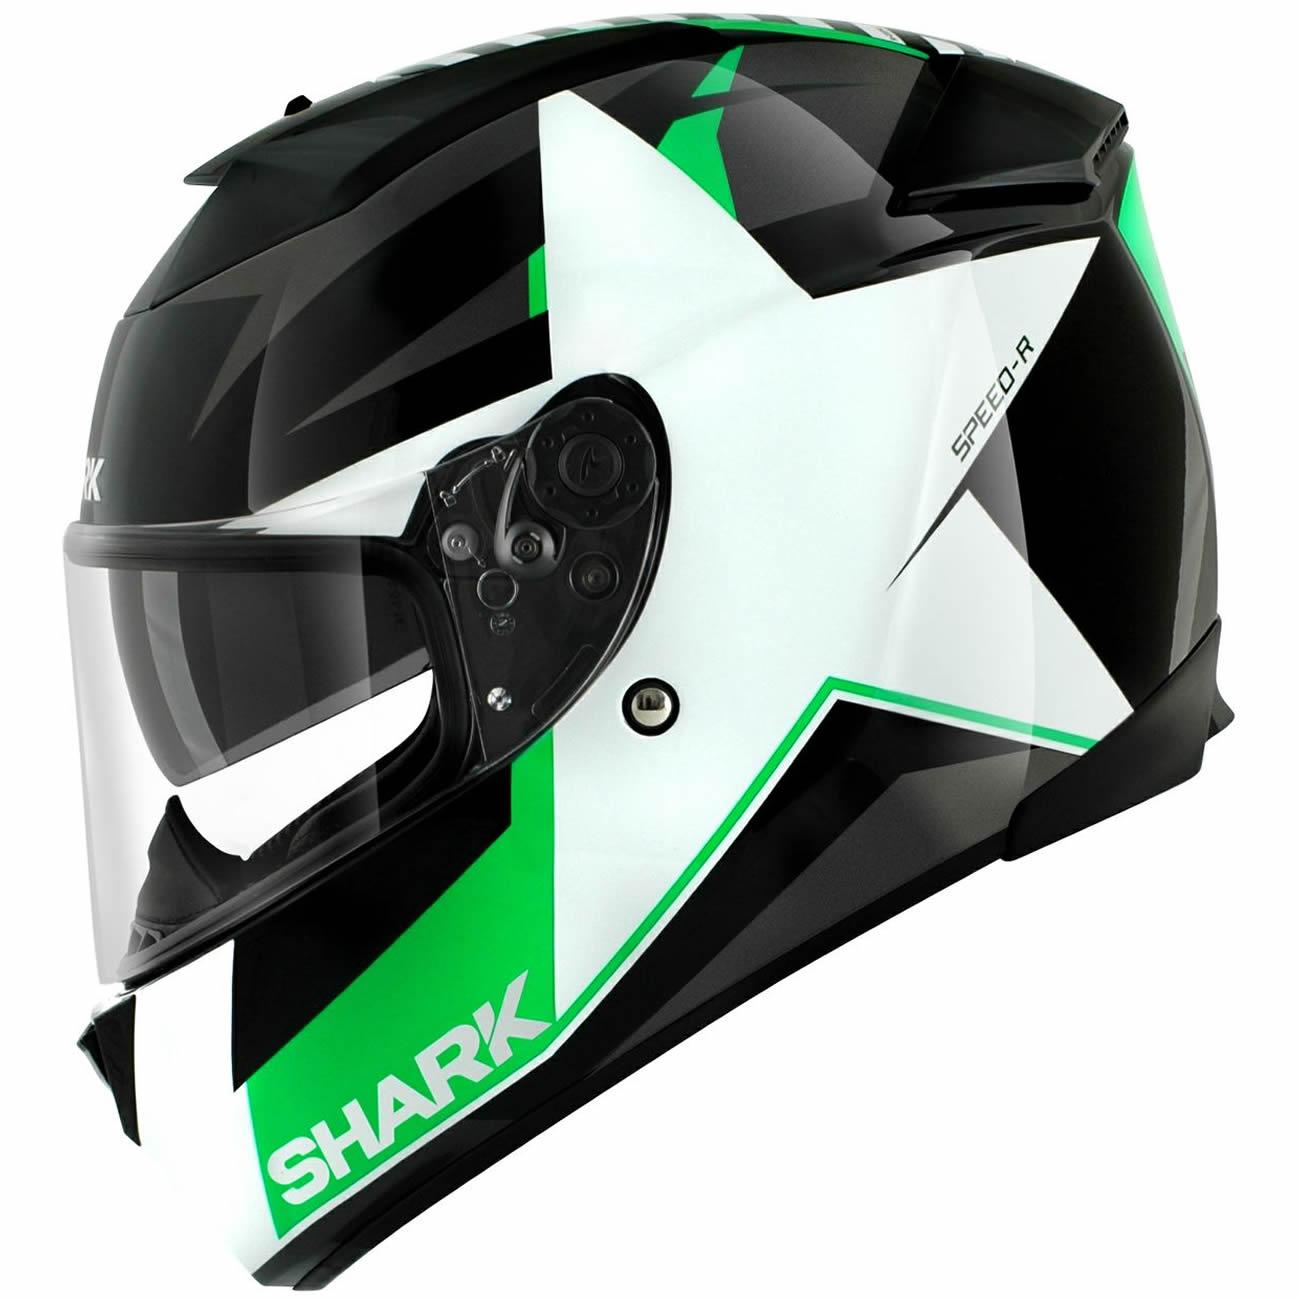 shark speed r texas black green motorcycle helmet track race racing acu gold ebay. Black Bedroom Furniture Sets. Home Design Ideas